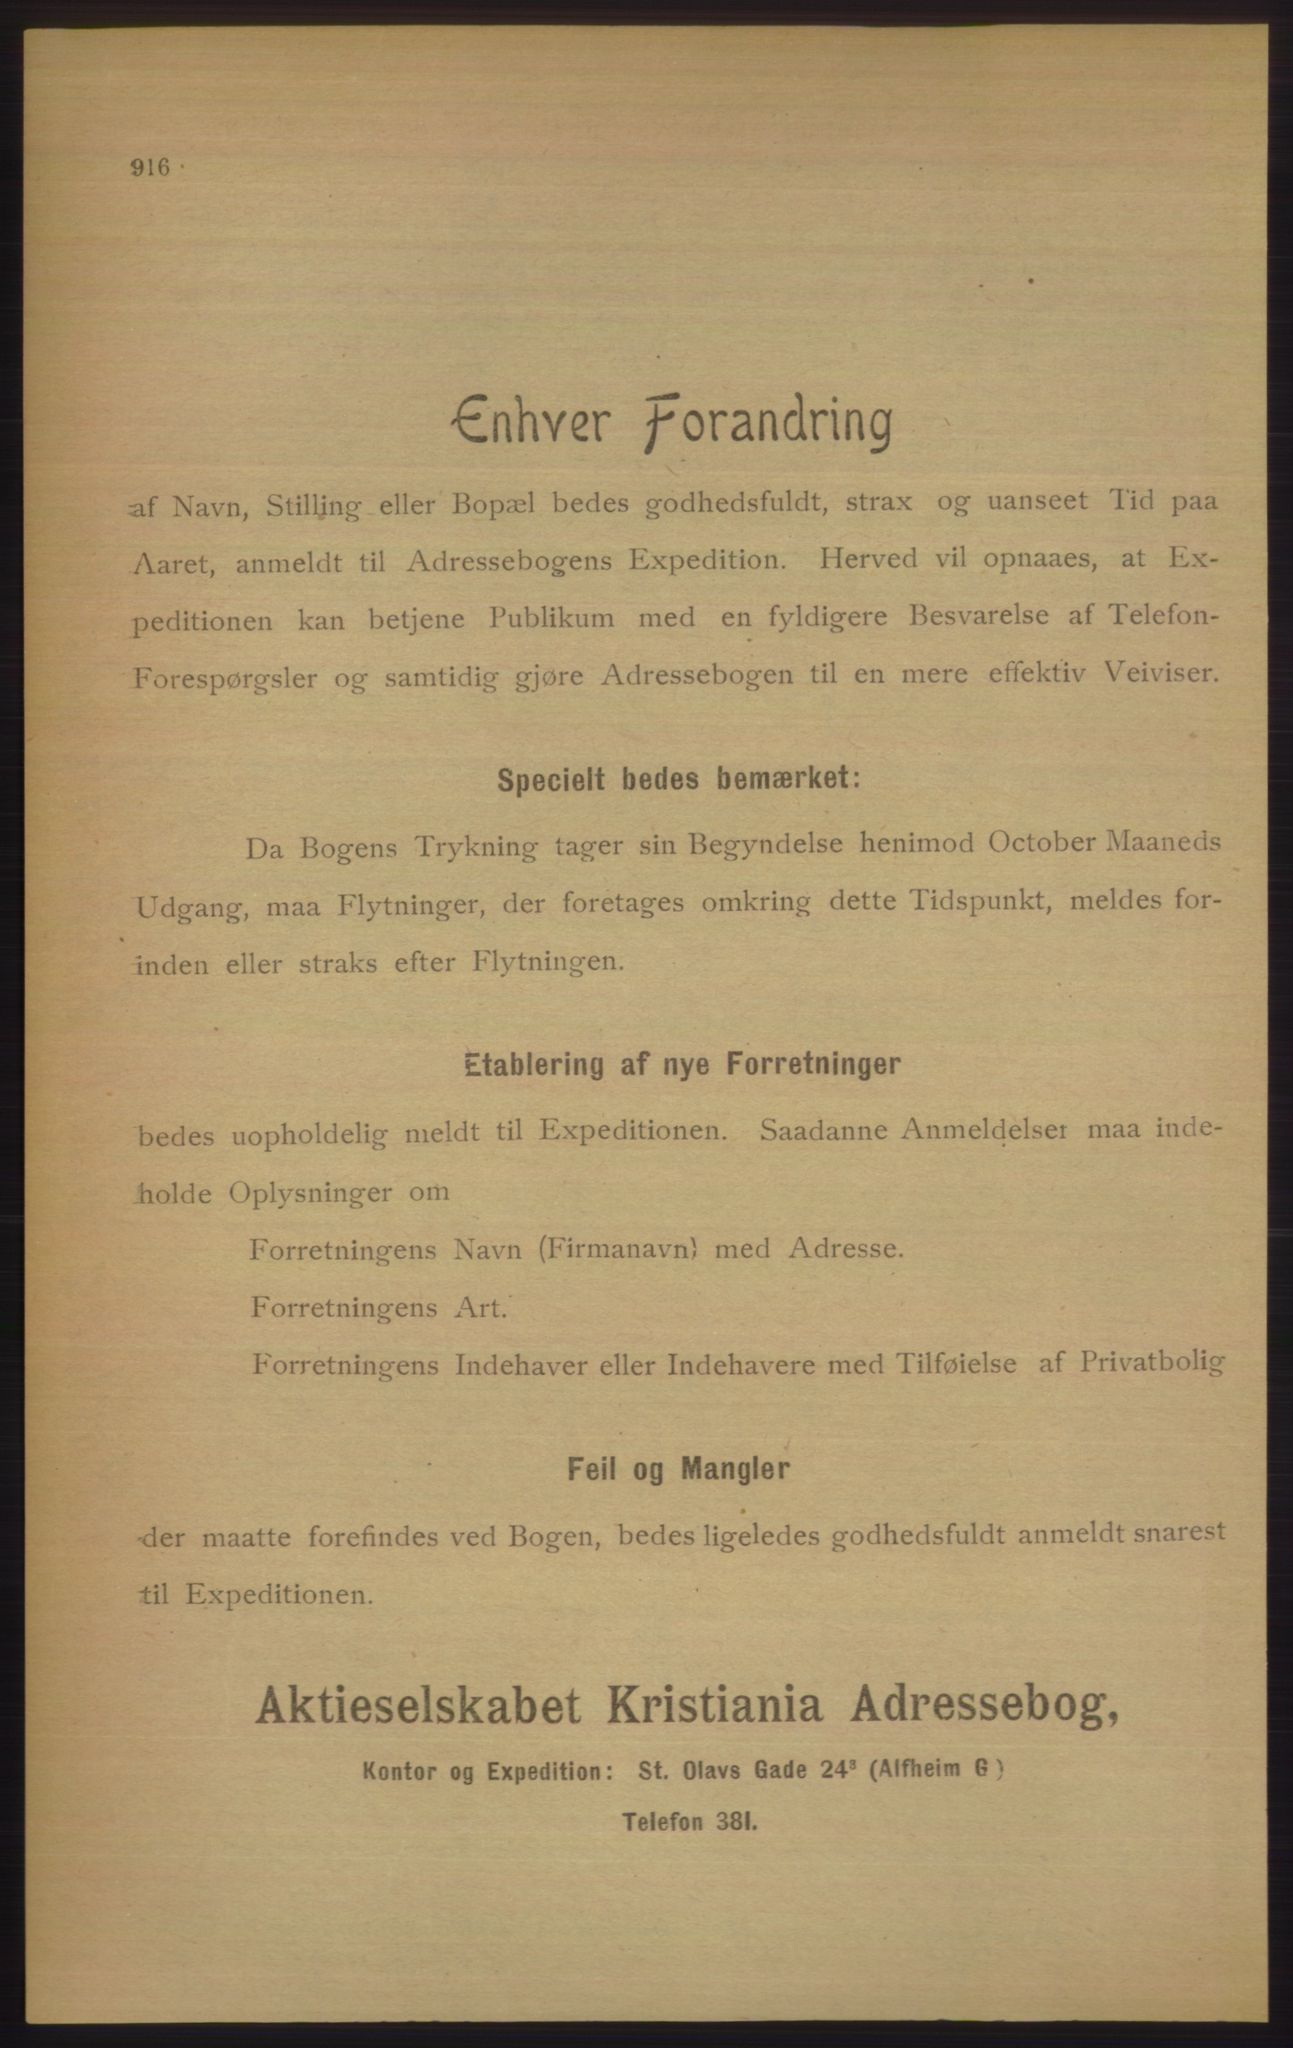 PUBL, Kristiania/Oslo adressebok, 1906, s. 916